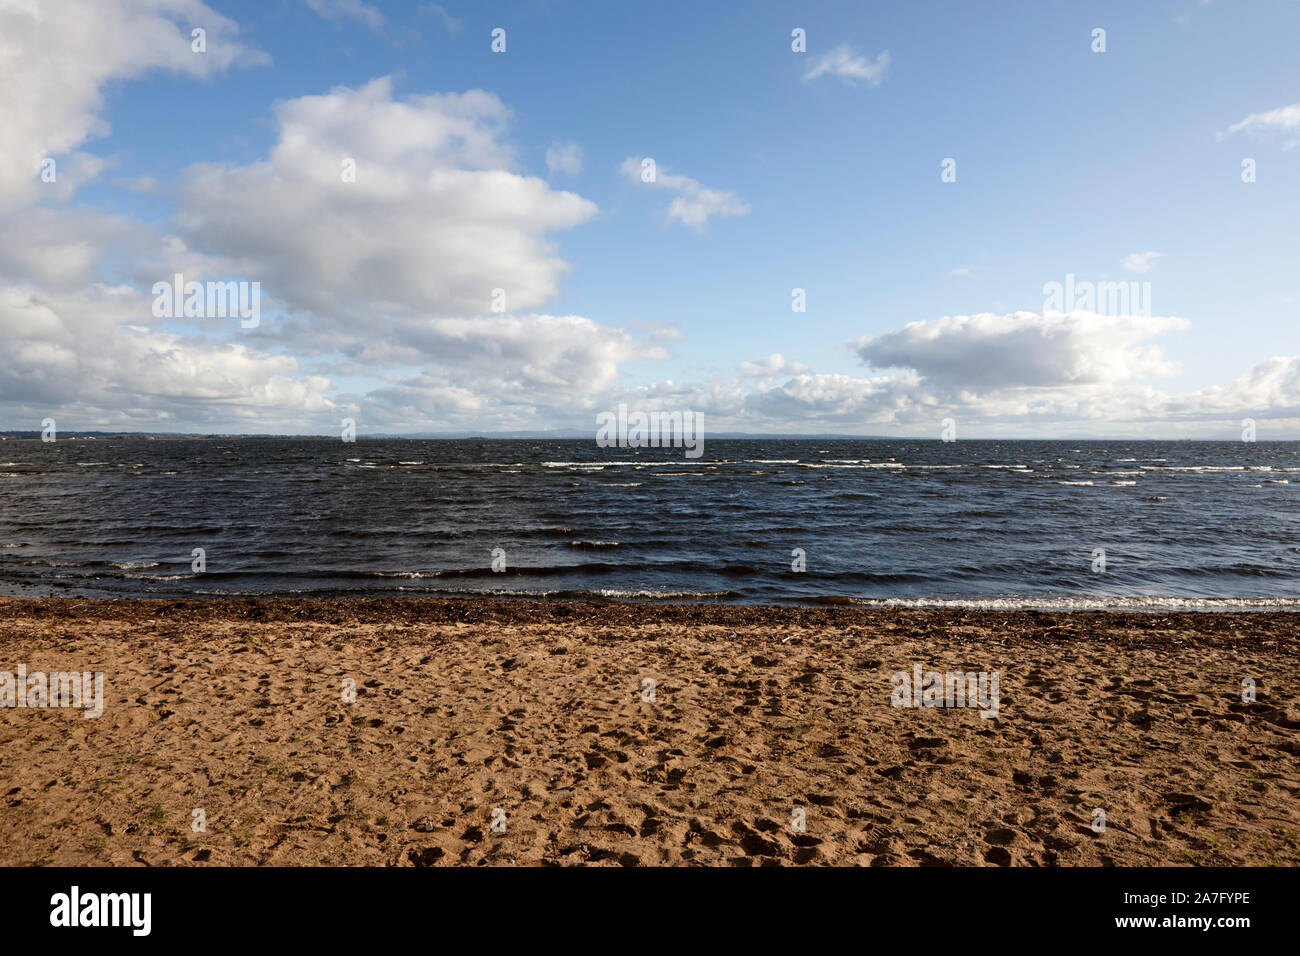 sandy beach at ballyronan on the shores of lough neagh County Derry Northern Ireland Stock Photo